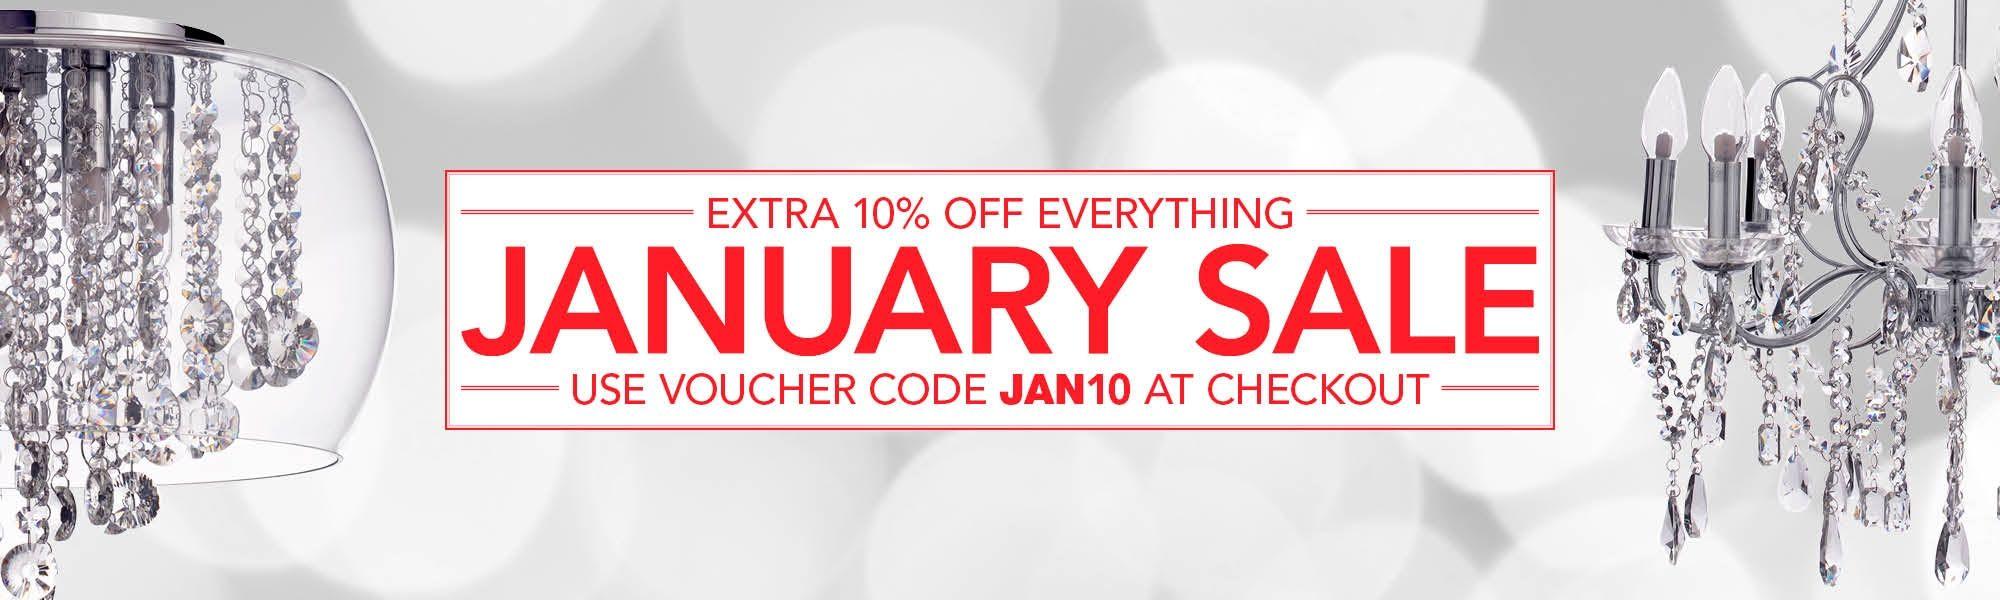 January Sale - Use JAN10 at Checkout